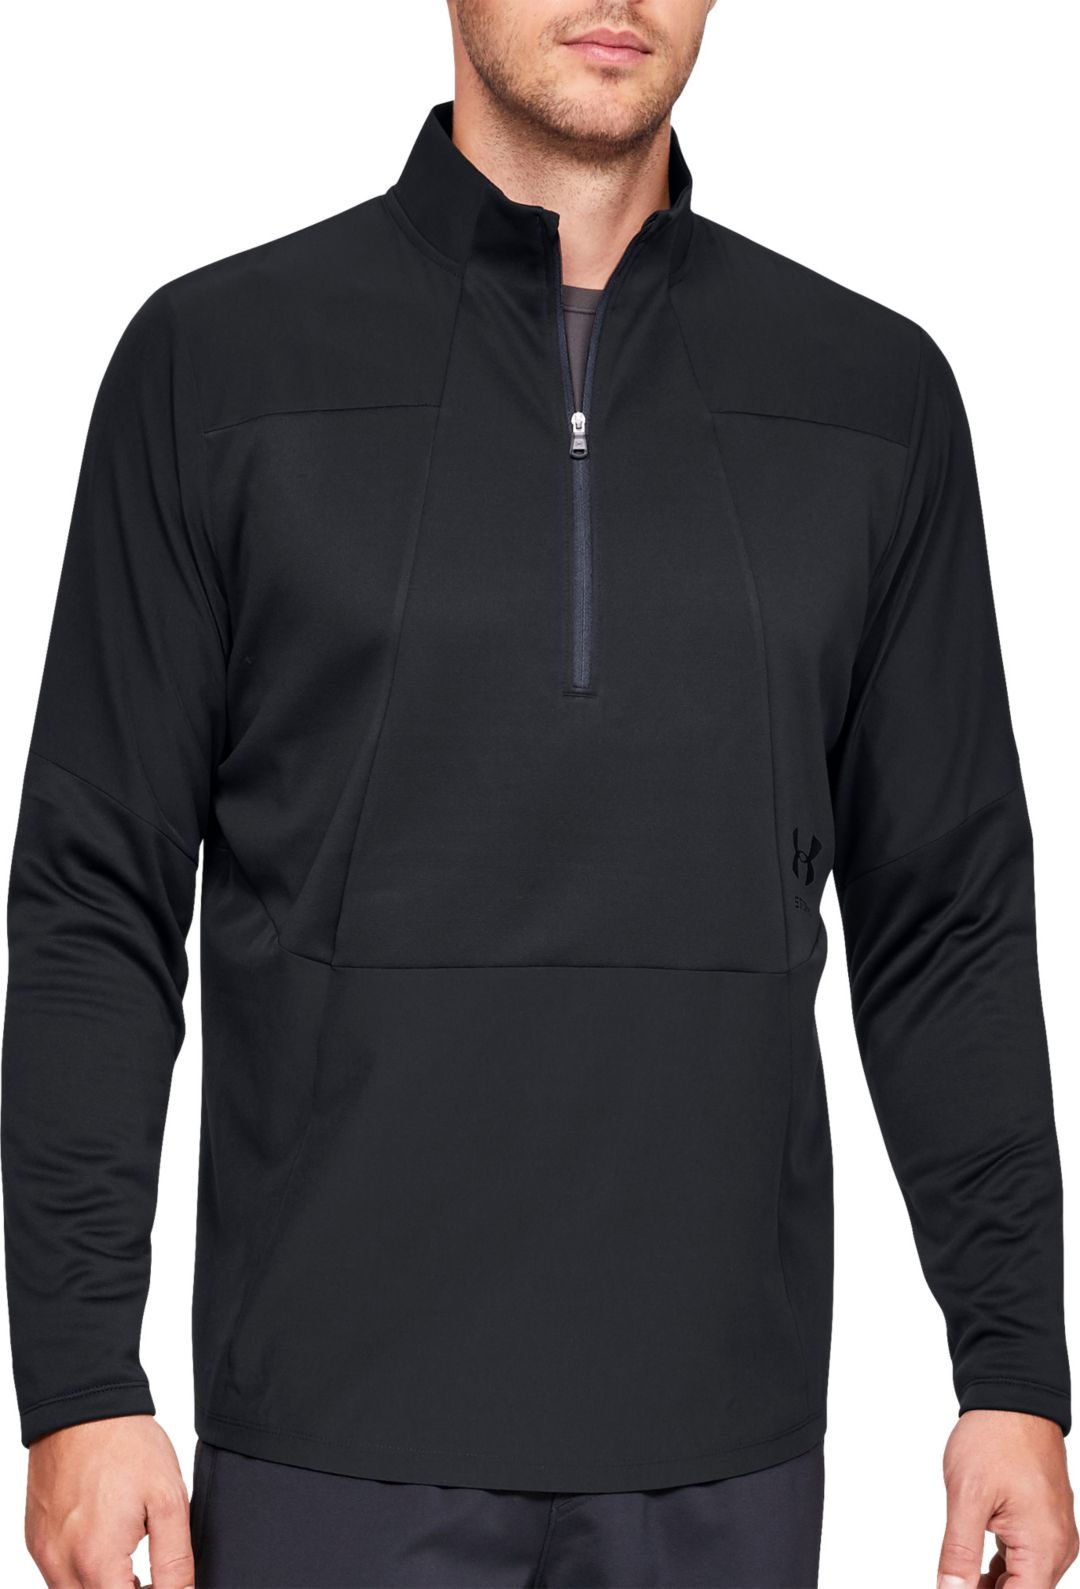 5ca01f9bb Under Armour Men's Storm Cycle ½ Zip Long Sleeve Shirt. noImageFound.  Previous